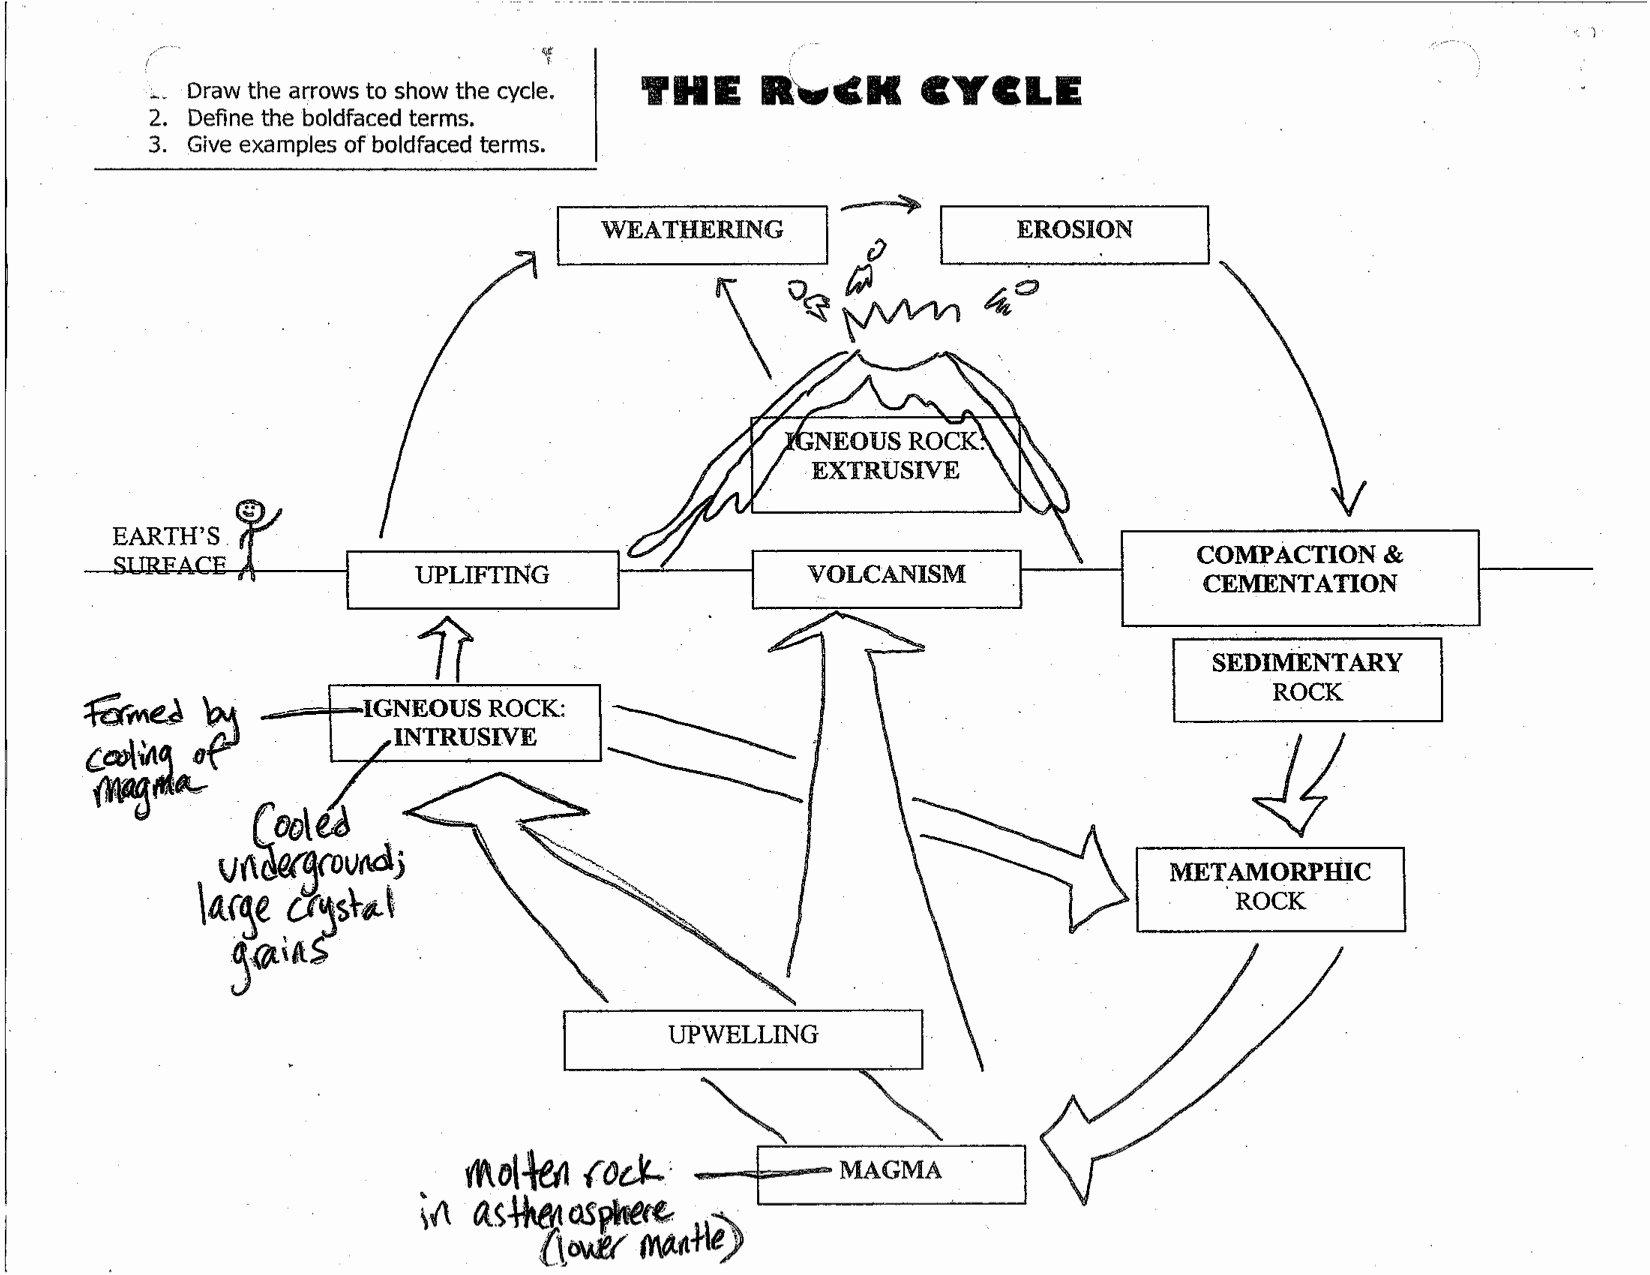 Rock Cycle Diagram Worksheet Awesome Worksheet Rock Cycle Diagram Worksheet Grass Fedjp